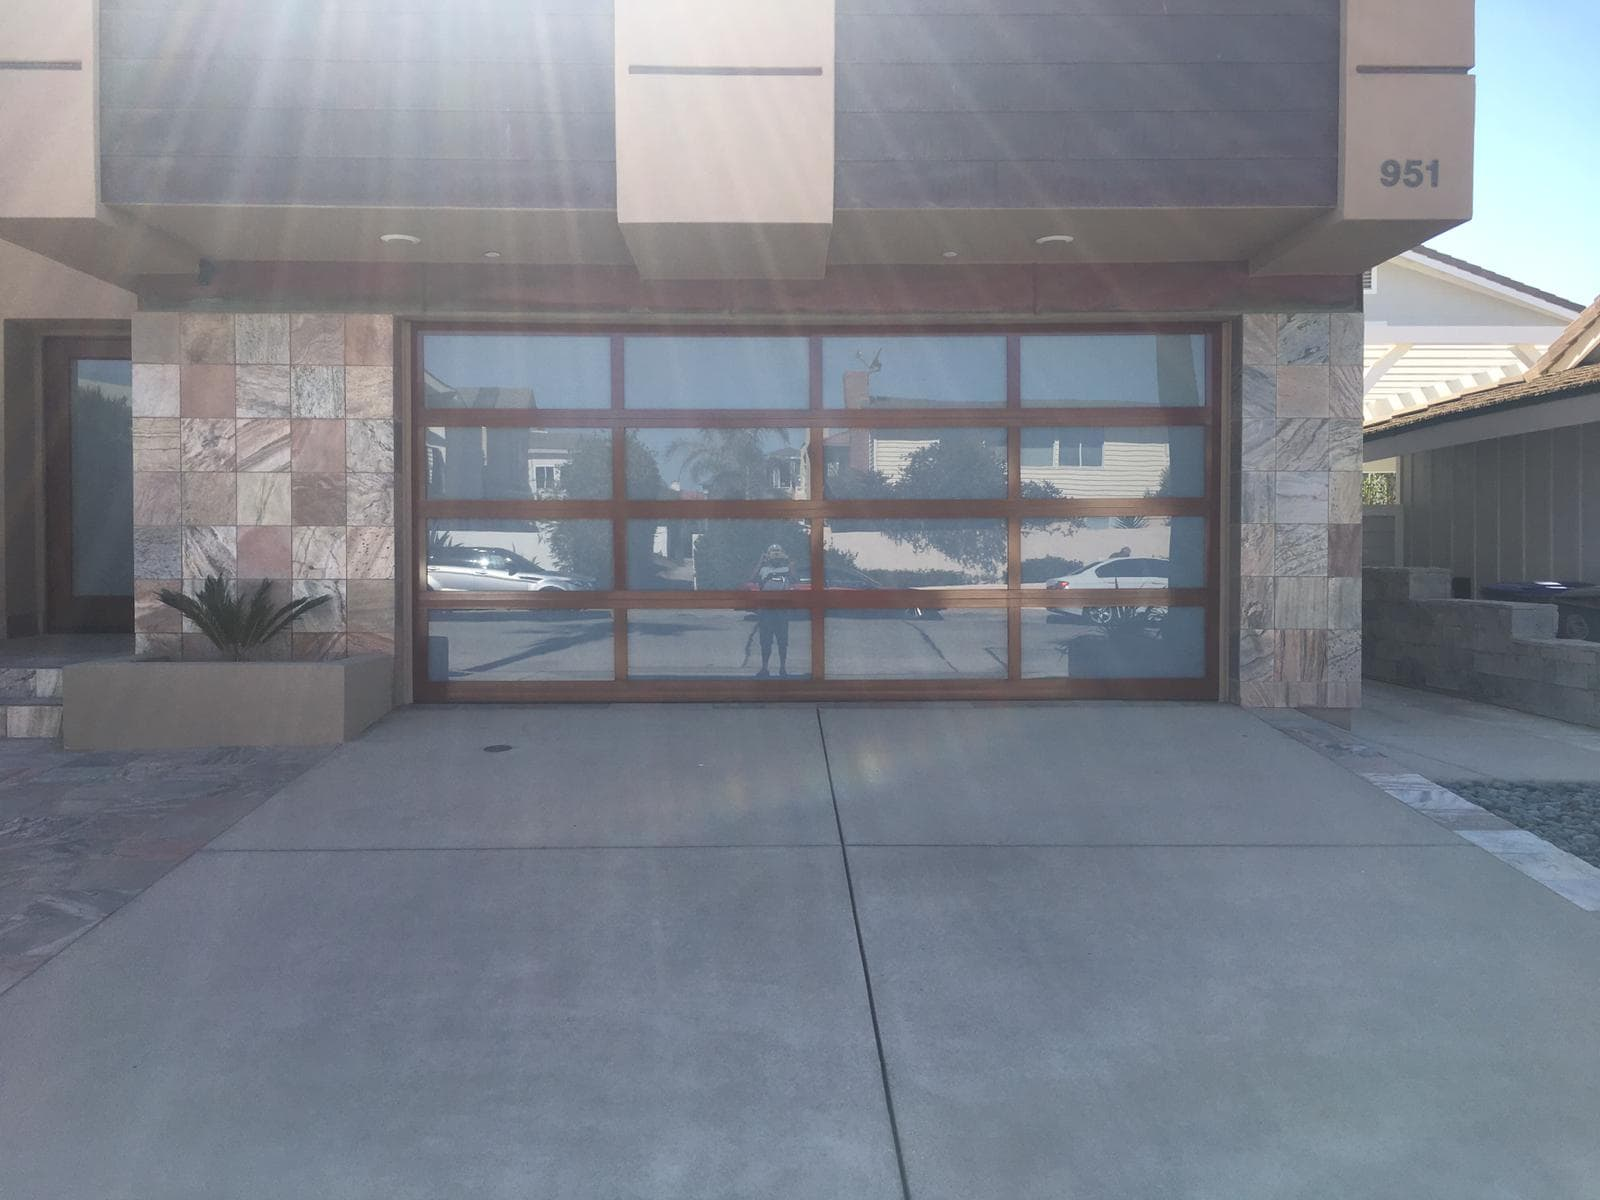 Kennedy Garage door repair and replacement